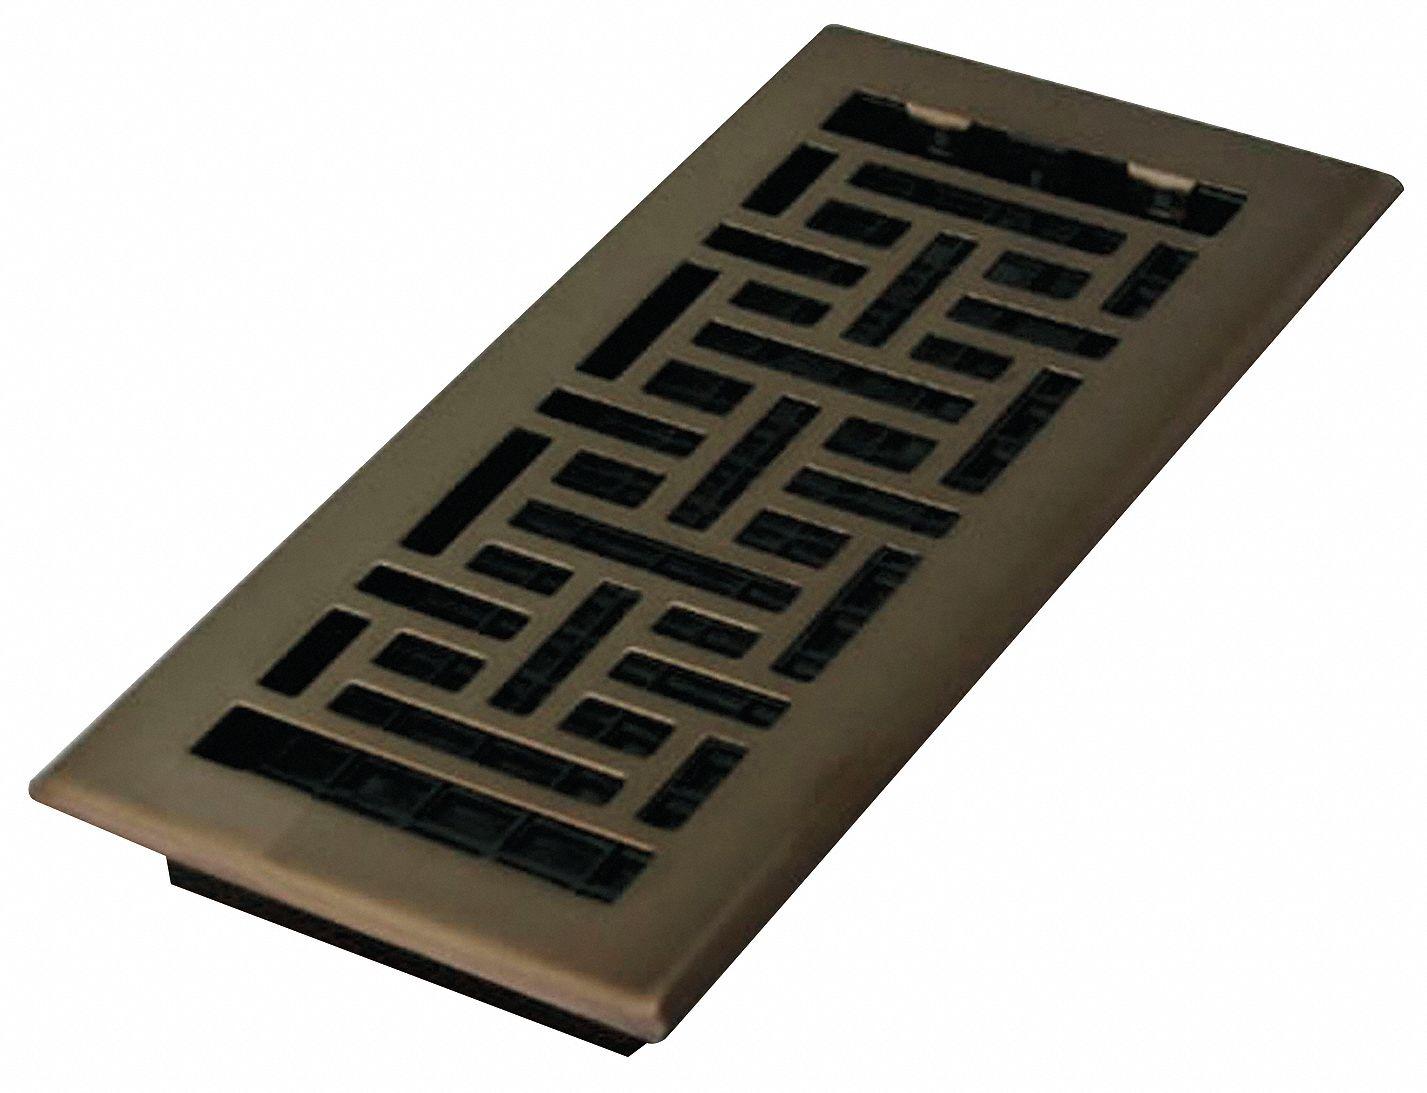 Decor Grates Floor Register 4x10 Rubbed Bronze 9 57 64 In Max Duct Height In 5tfj6 Ajh410 Rb Grainger